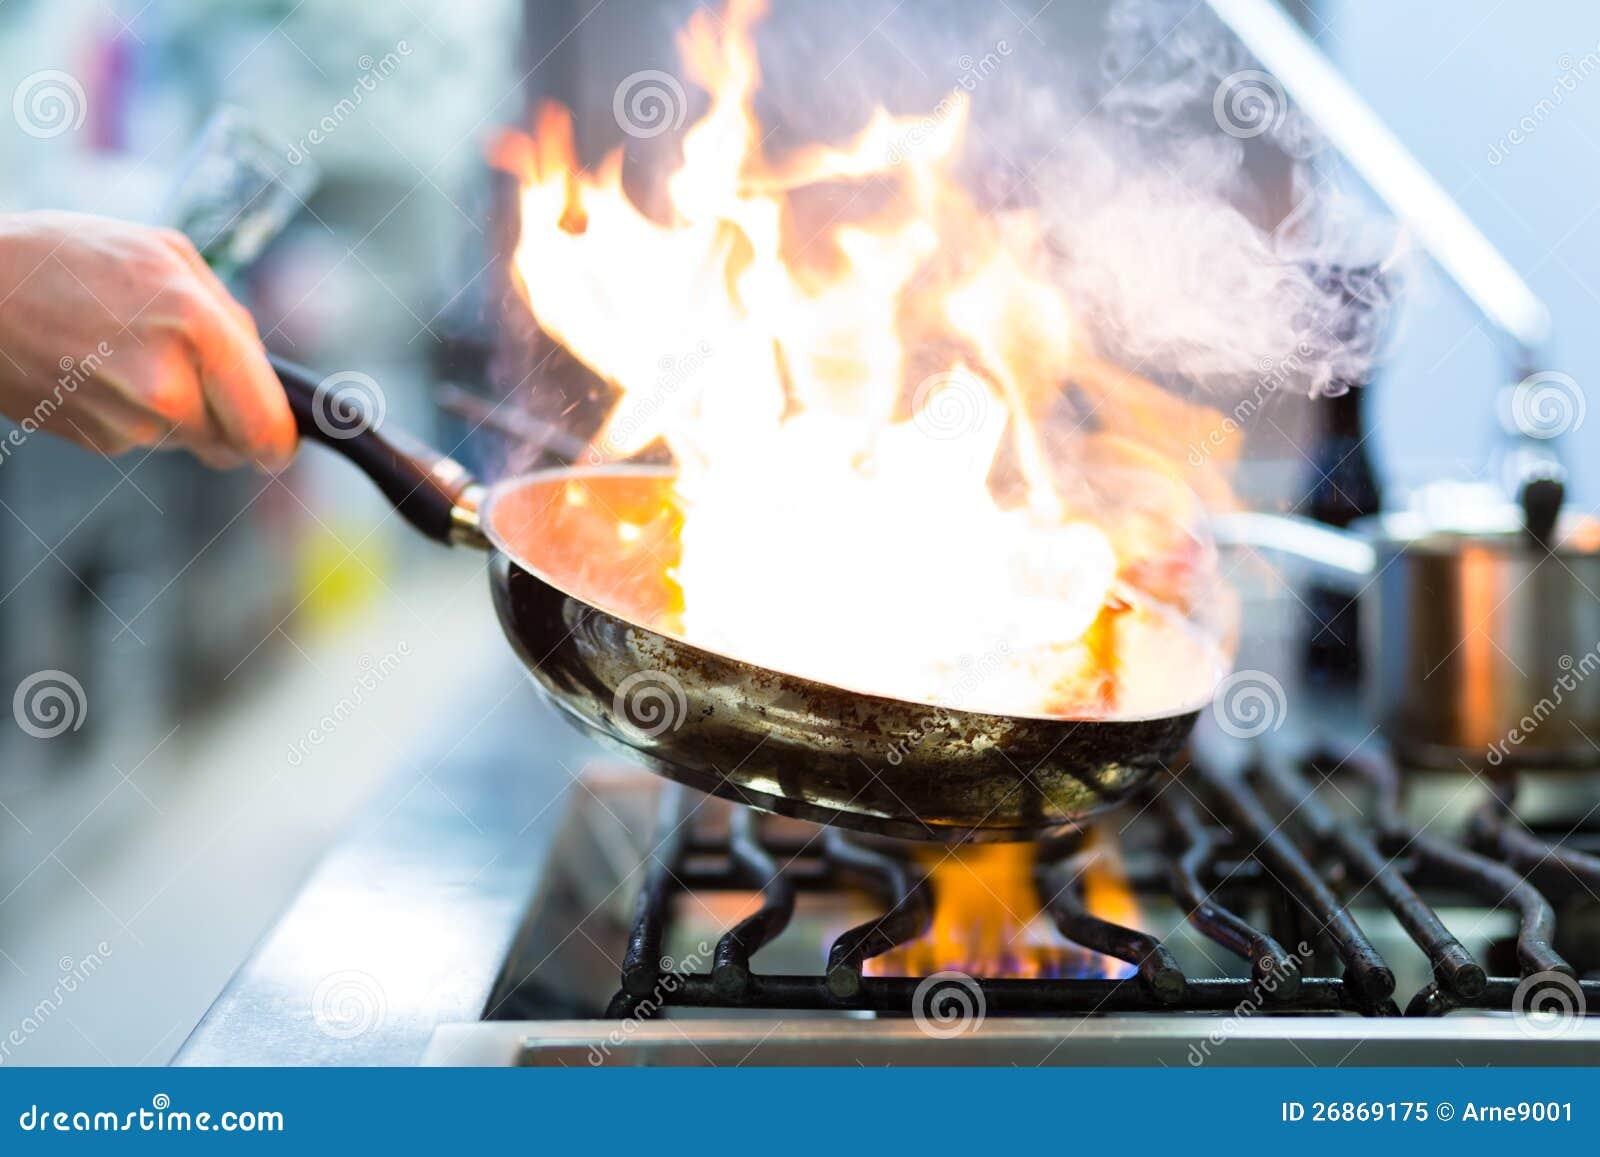 Шеф-повар в кухне ресторана на печке с лотком